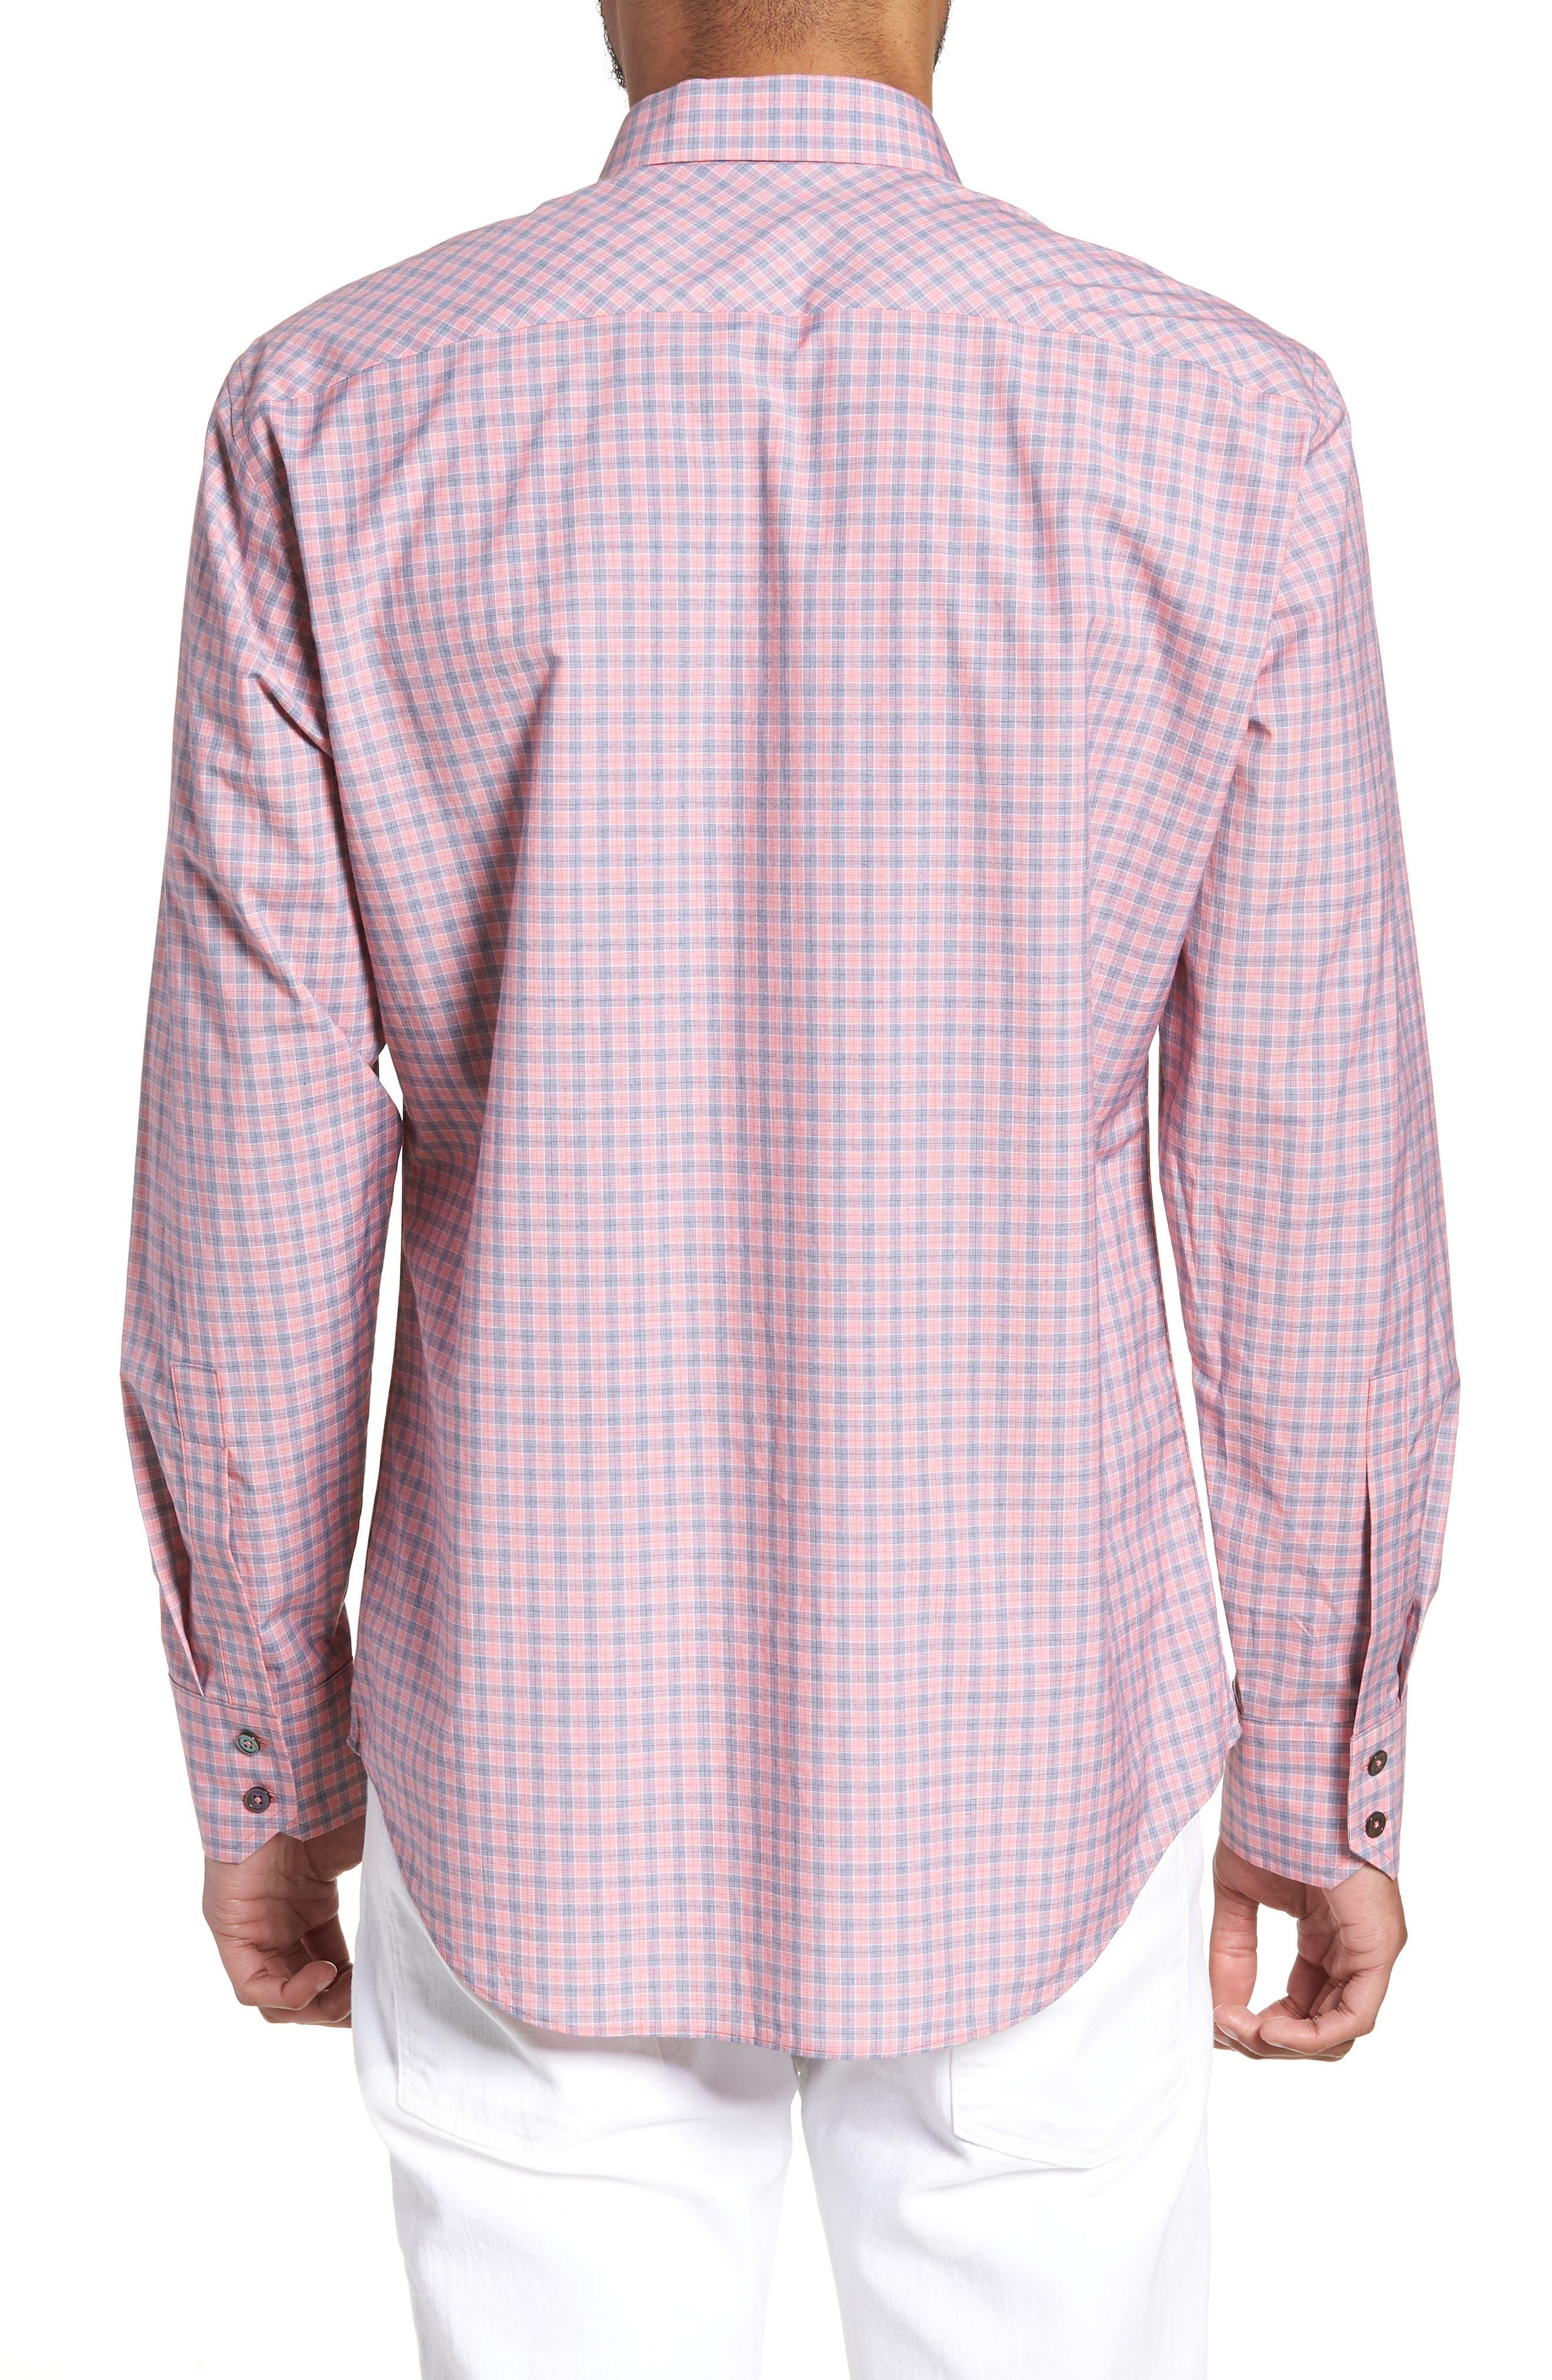 Sherif Regular Fit Sport Shirt,                             Alternate thumbnail 2, color,